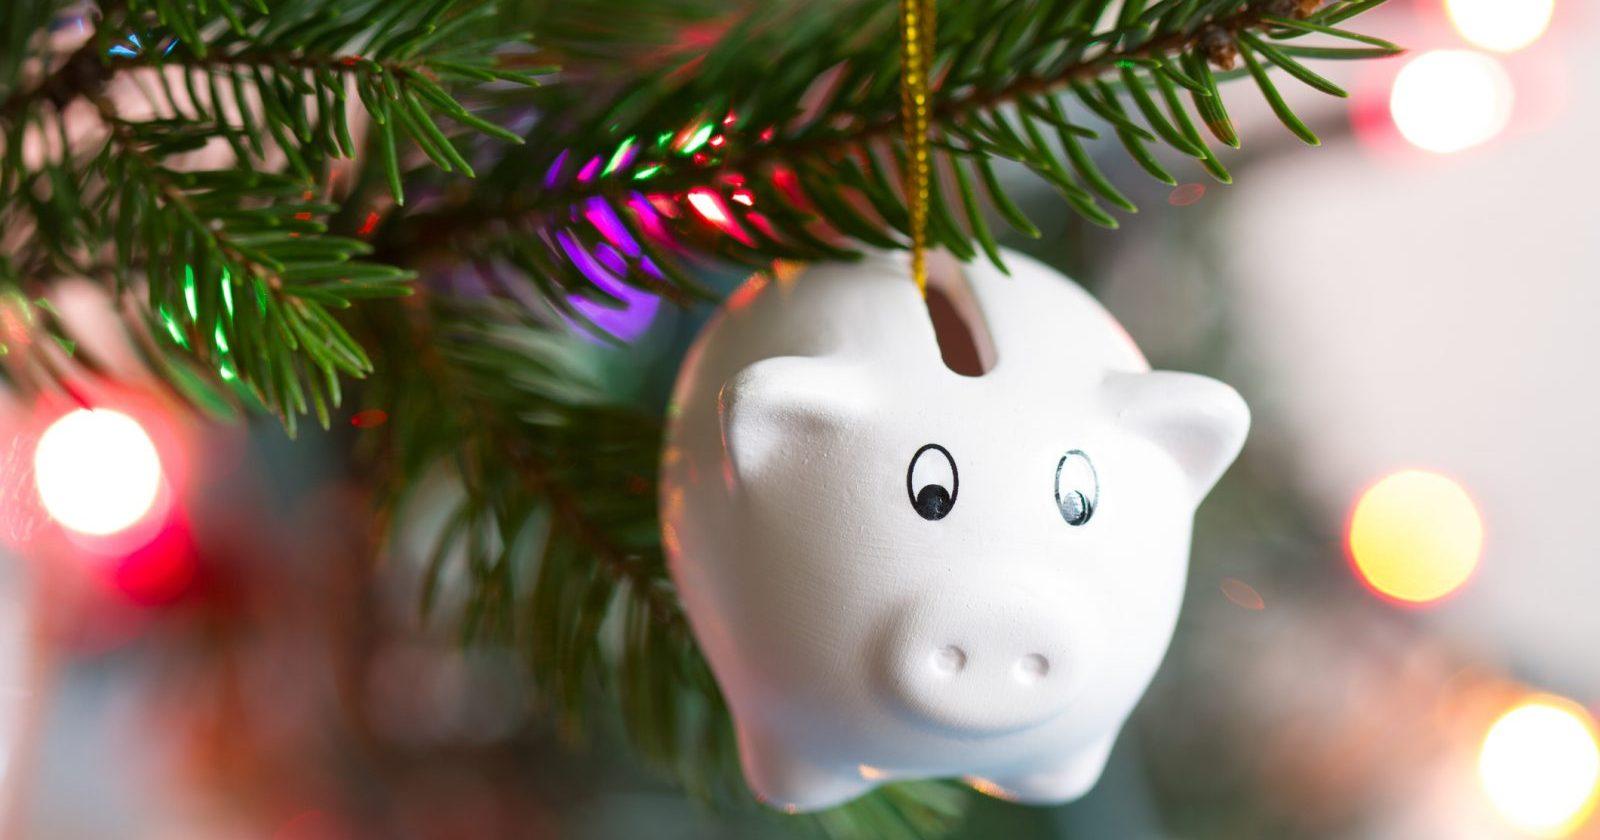 Saving Money in the Winter